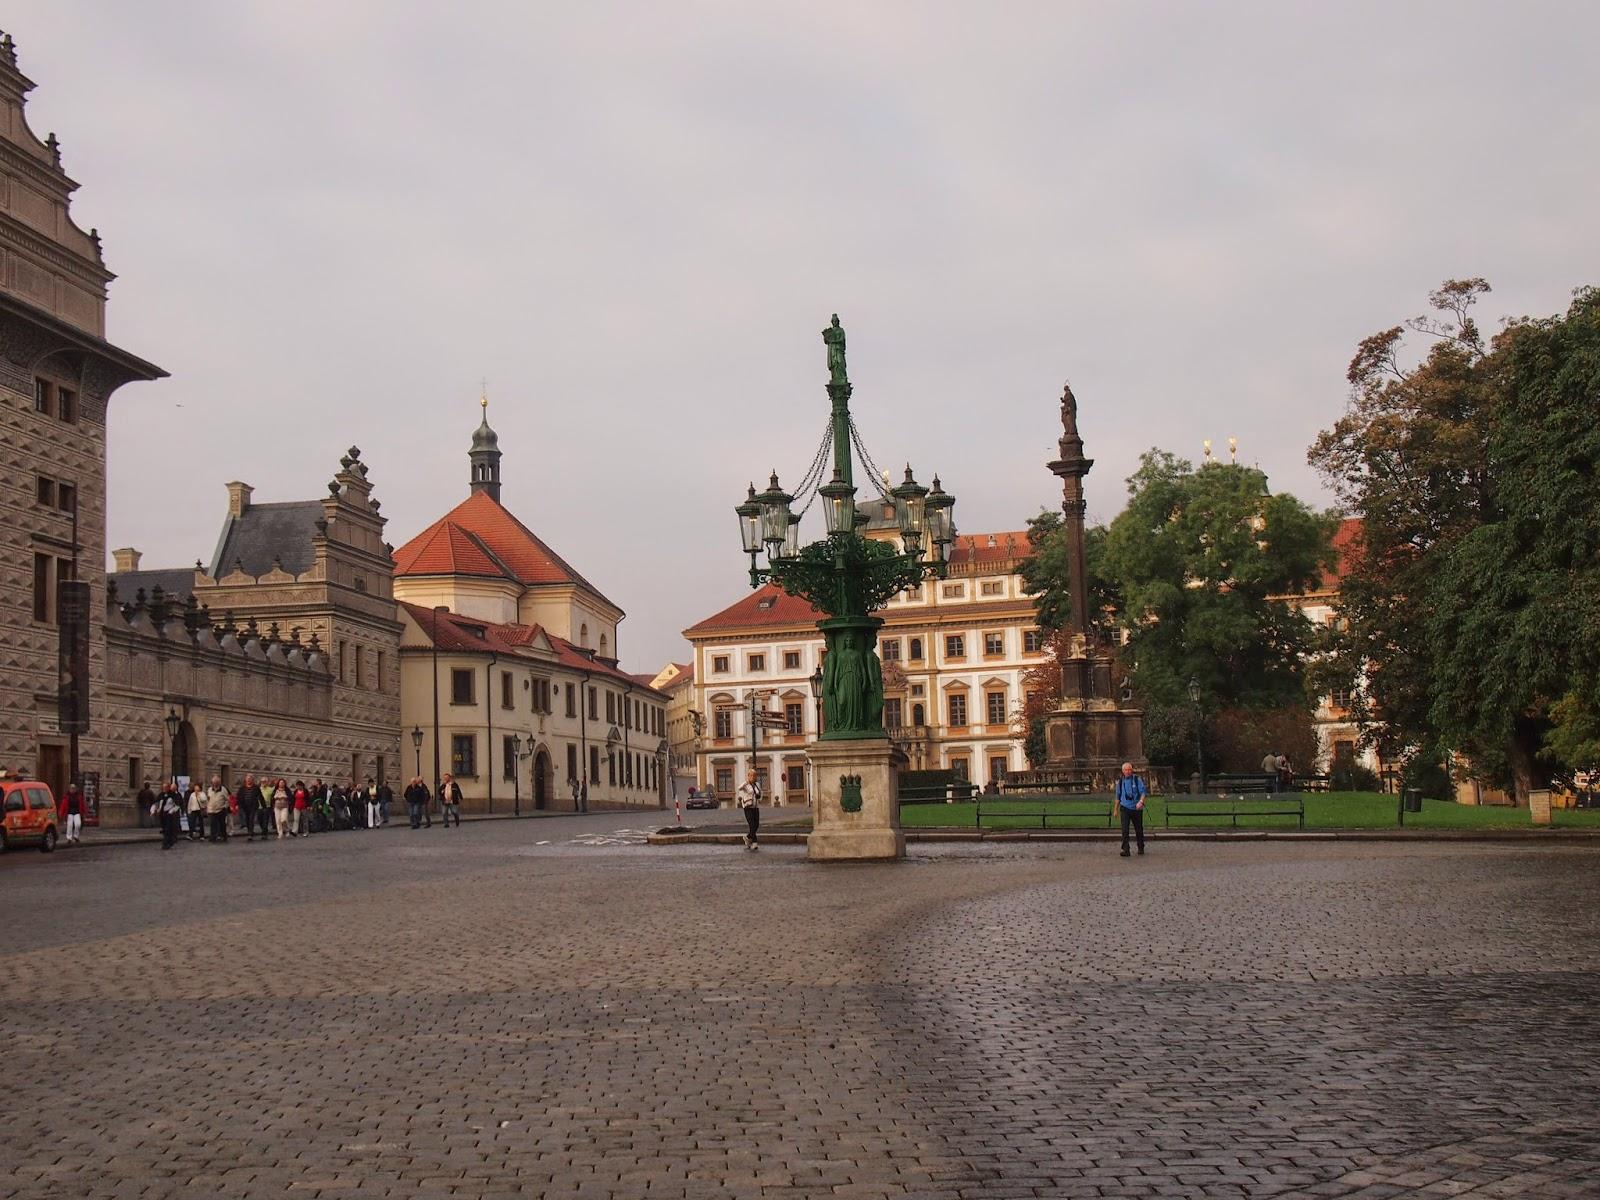 The Prague Castle Courtyard